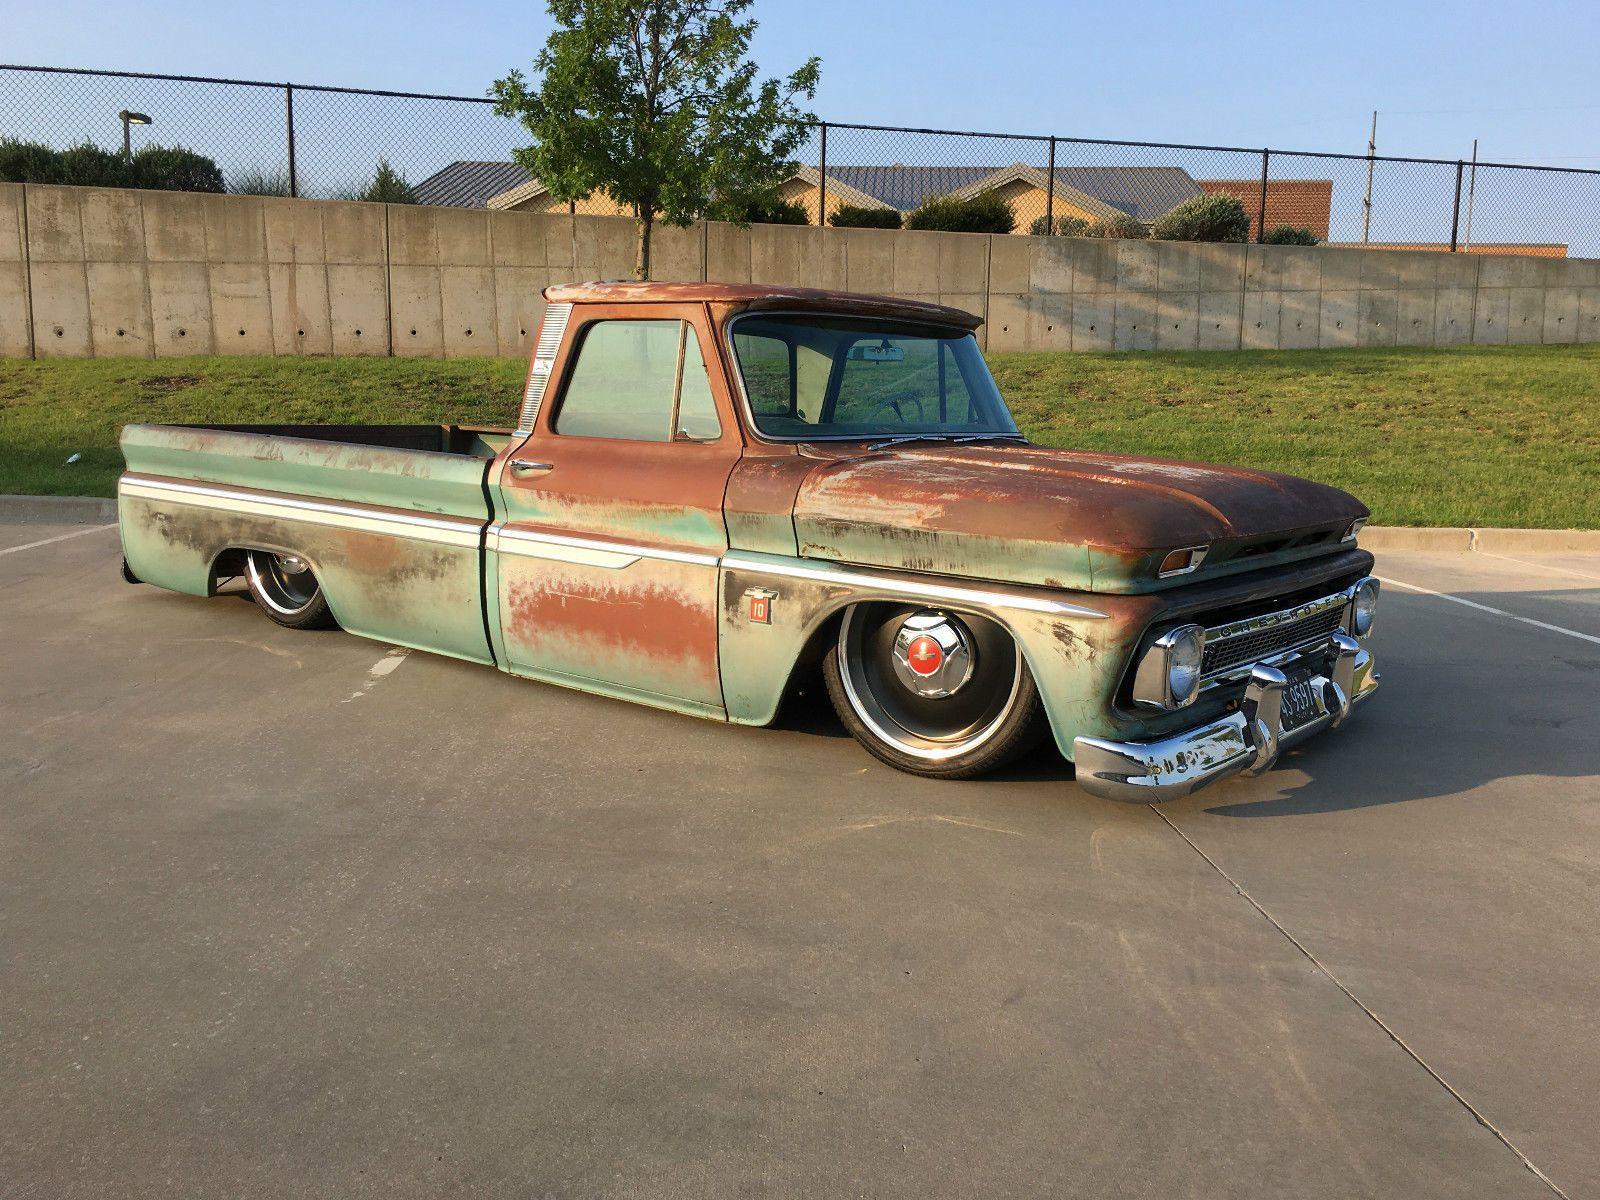 Chevrolet c 10 custom 1964 chevrolet c 10 patina truck 5 3 ls engine clean